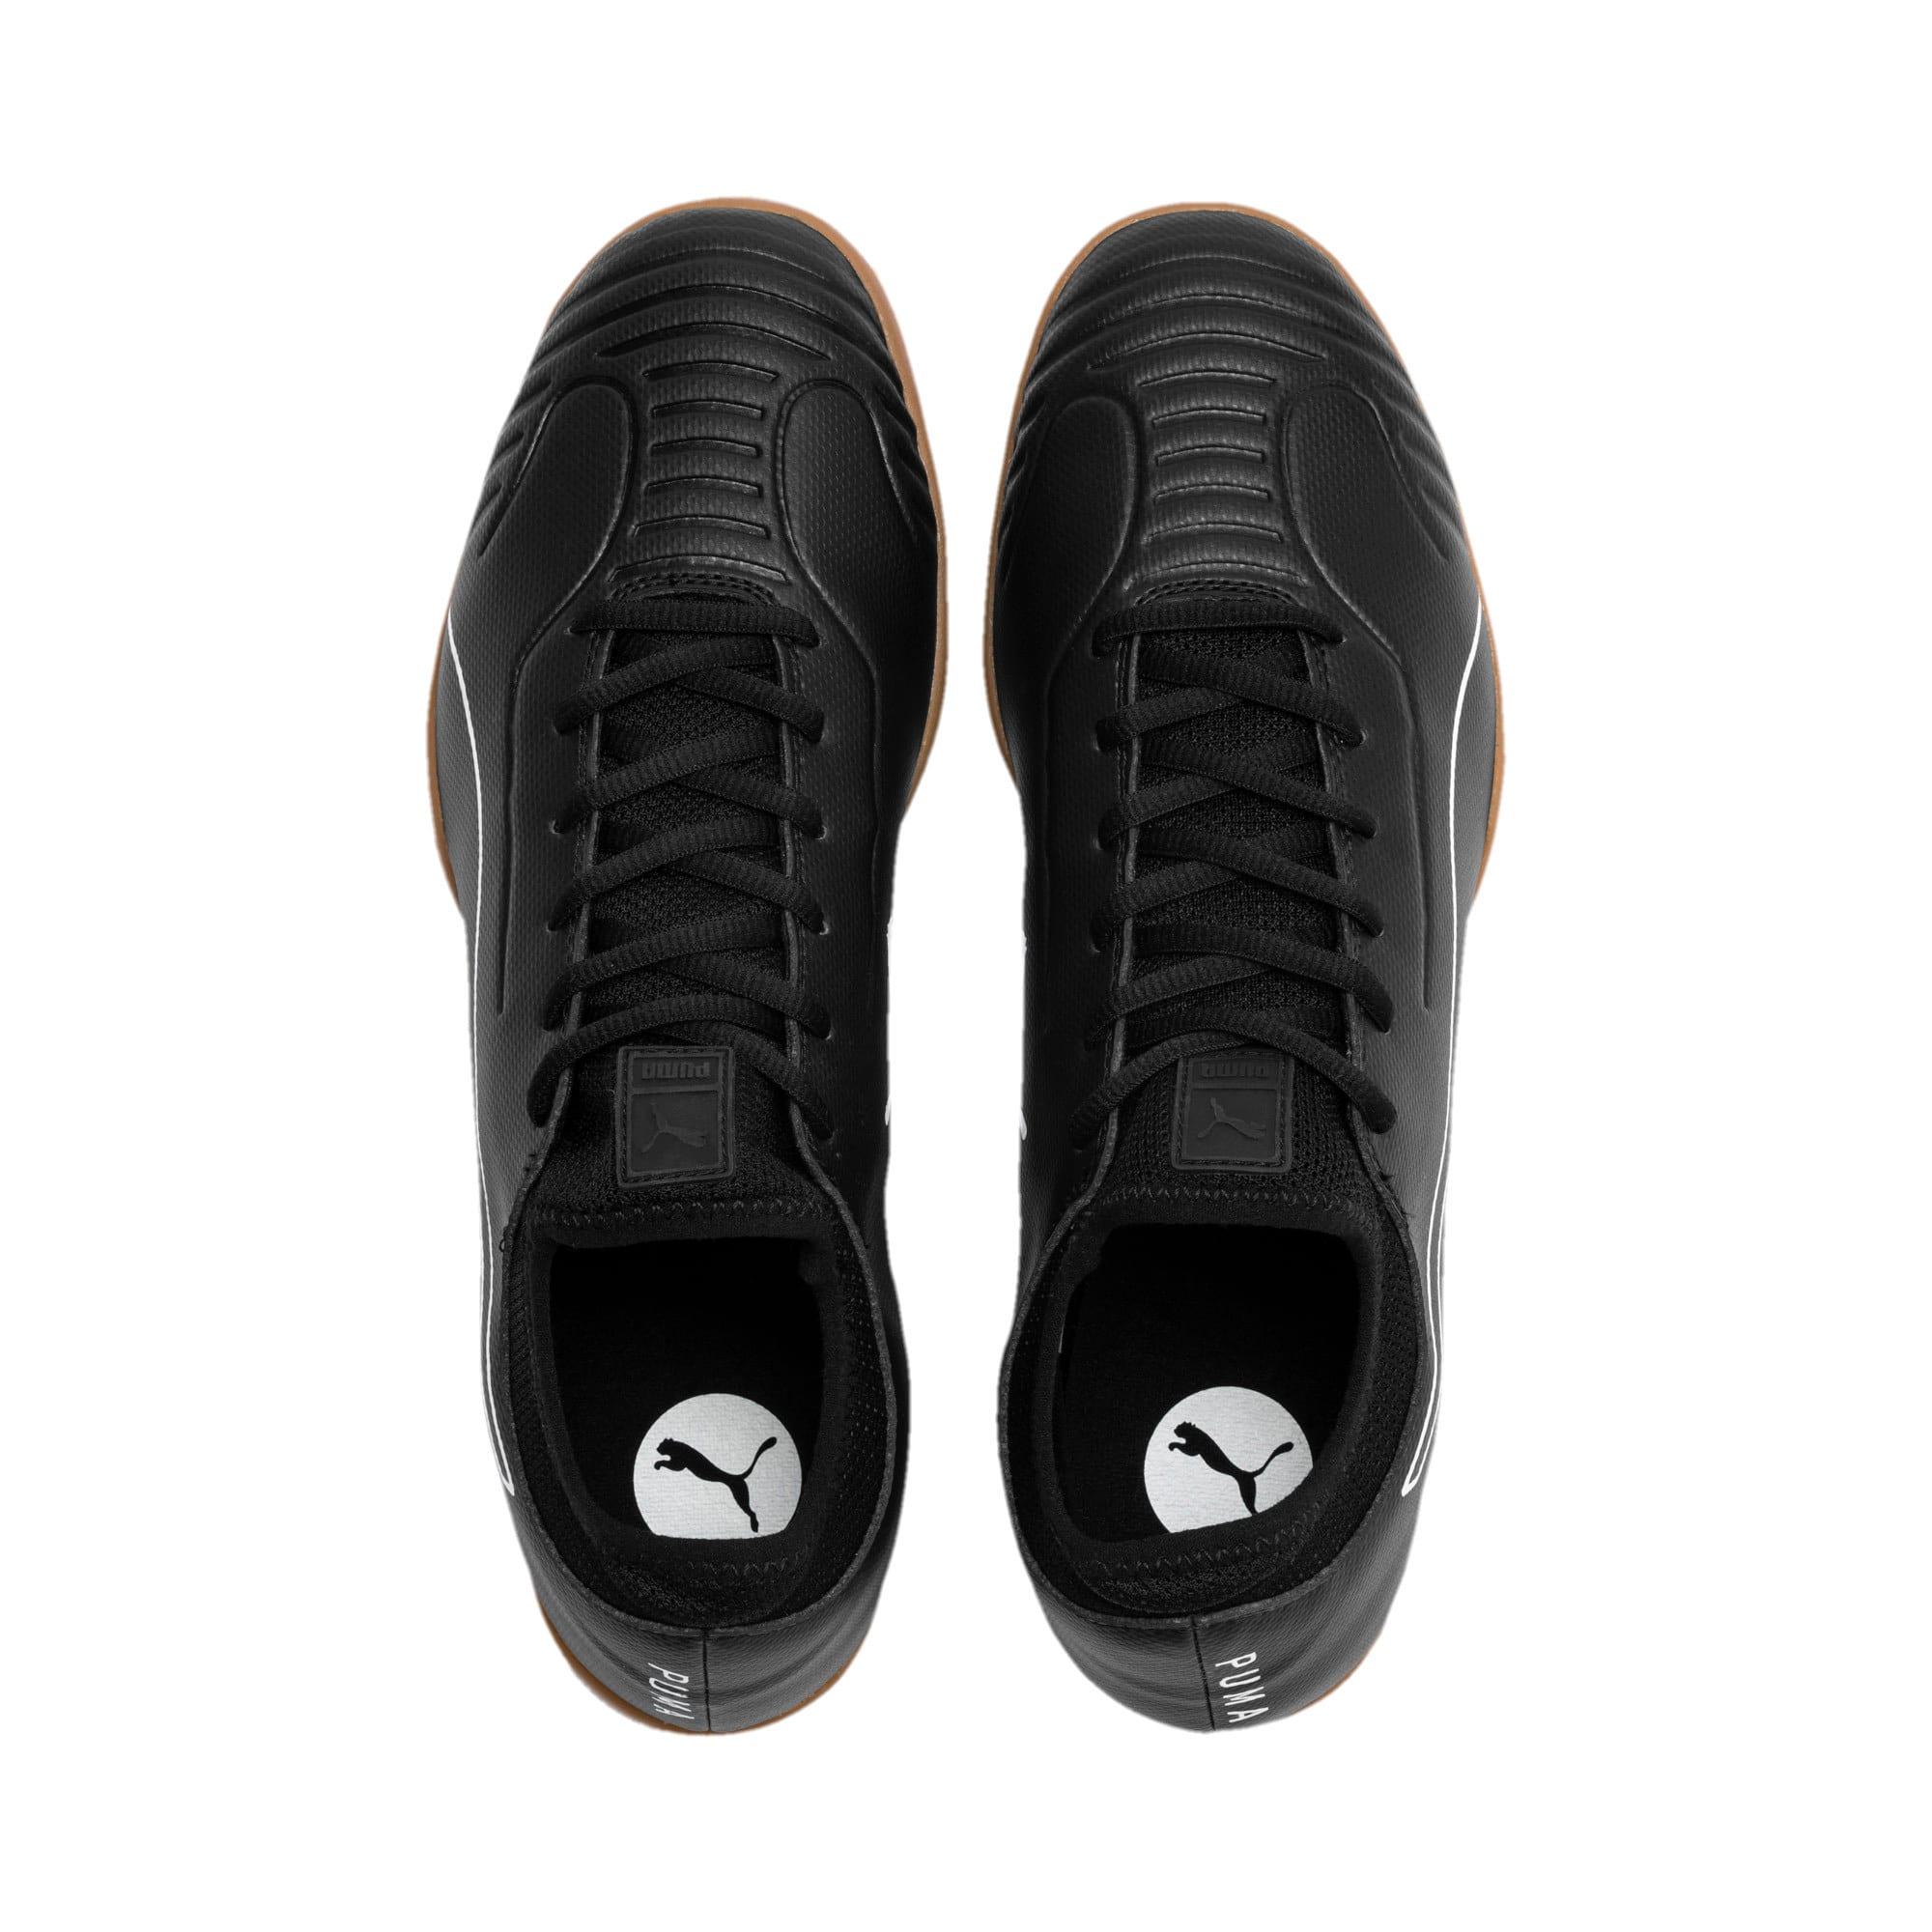 Thumbnail 7 of 365 Sala 2 Men's Football Boots, Puma Black-Puma White-Gum, medium